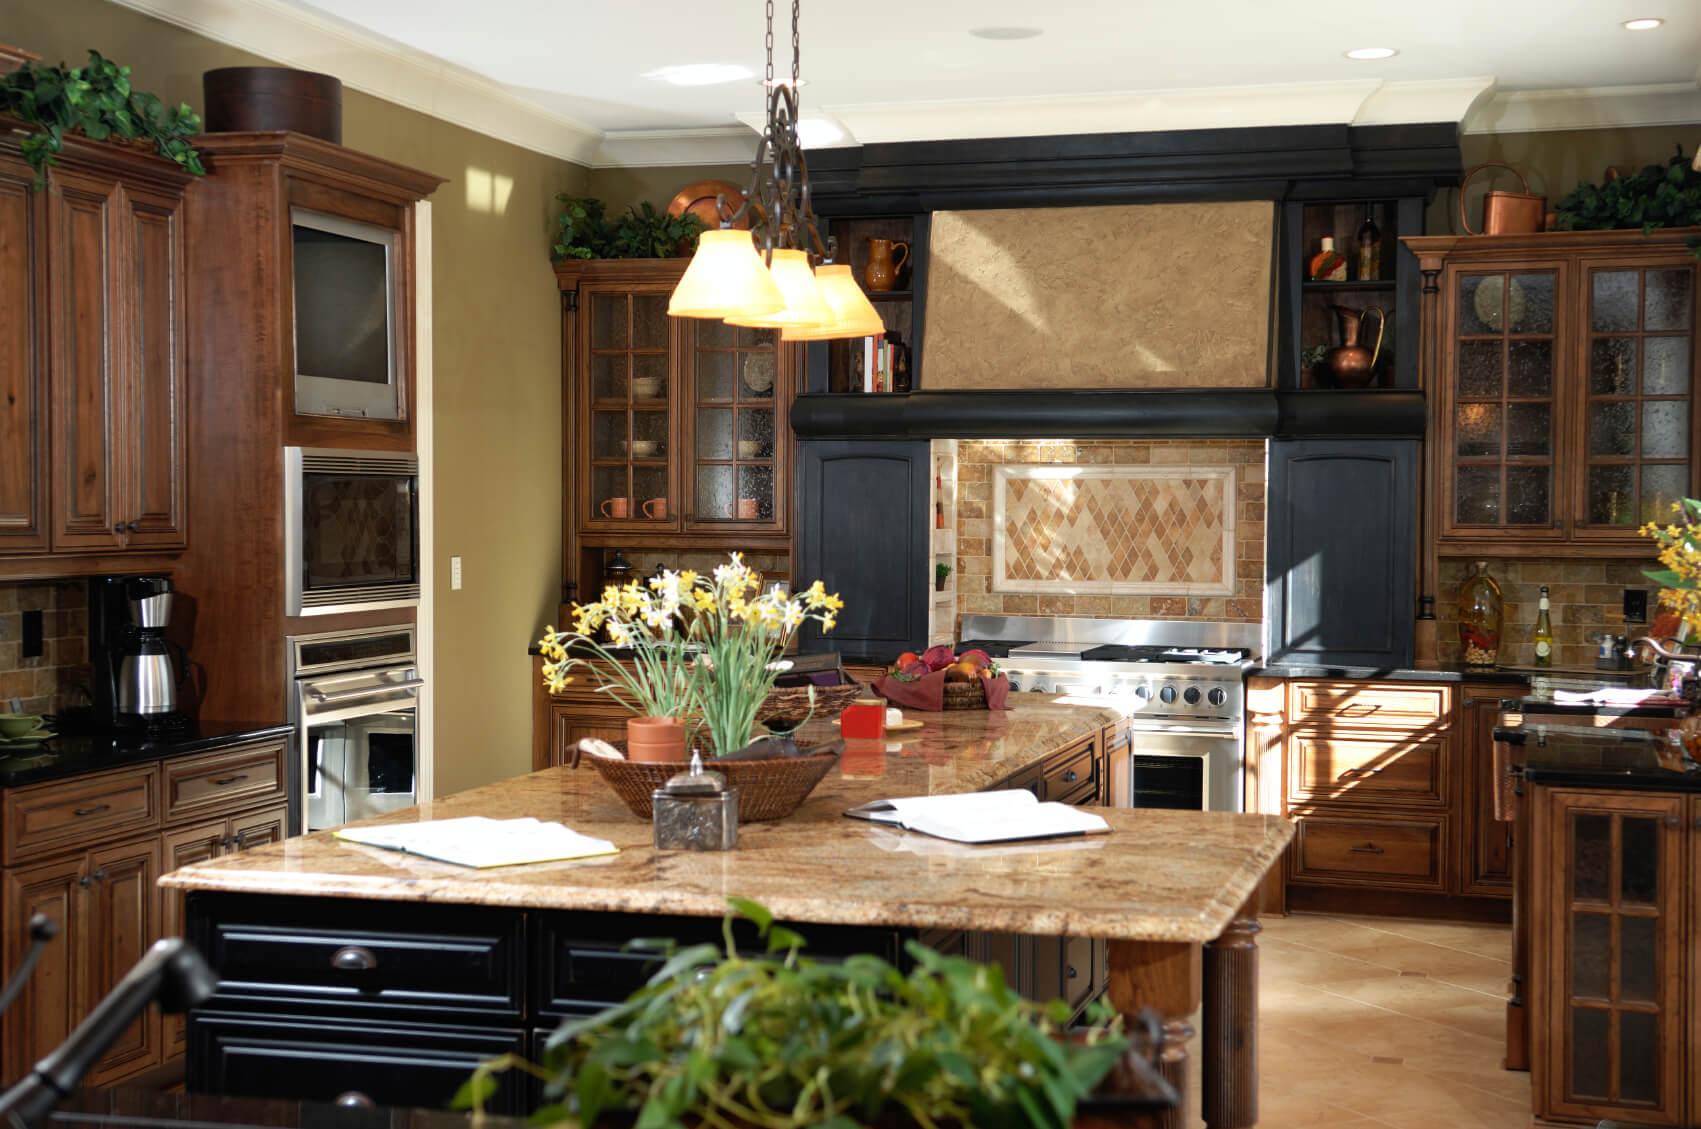 40 magnificent kitchen designs with dark cabinets cherry wood cabinets kitchen Black wood cabinetry surrounds range with beige tile backsplash in this detailed kitchen L